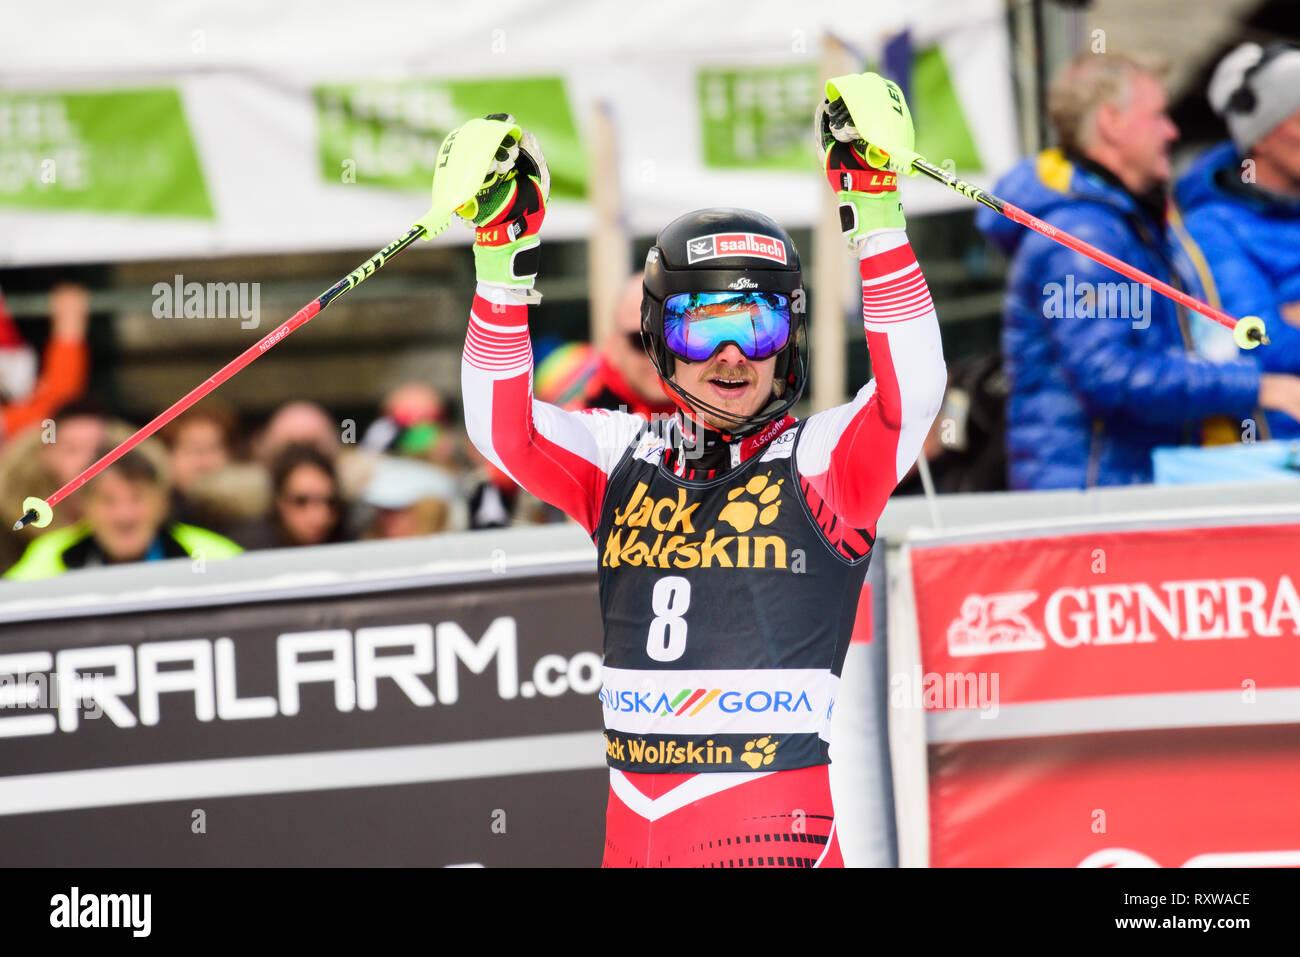 Kranjska Gora Slovenia 10th Mar 2019 Manuel Feller Of Austria In Action During The Slalom Race At The Audi Fis Ski World Cup Vitranc On March 10 2019 In Kranjska Gora Slovenia